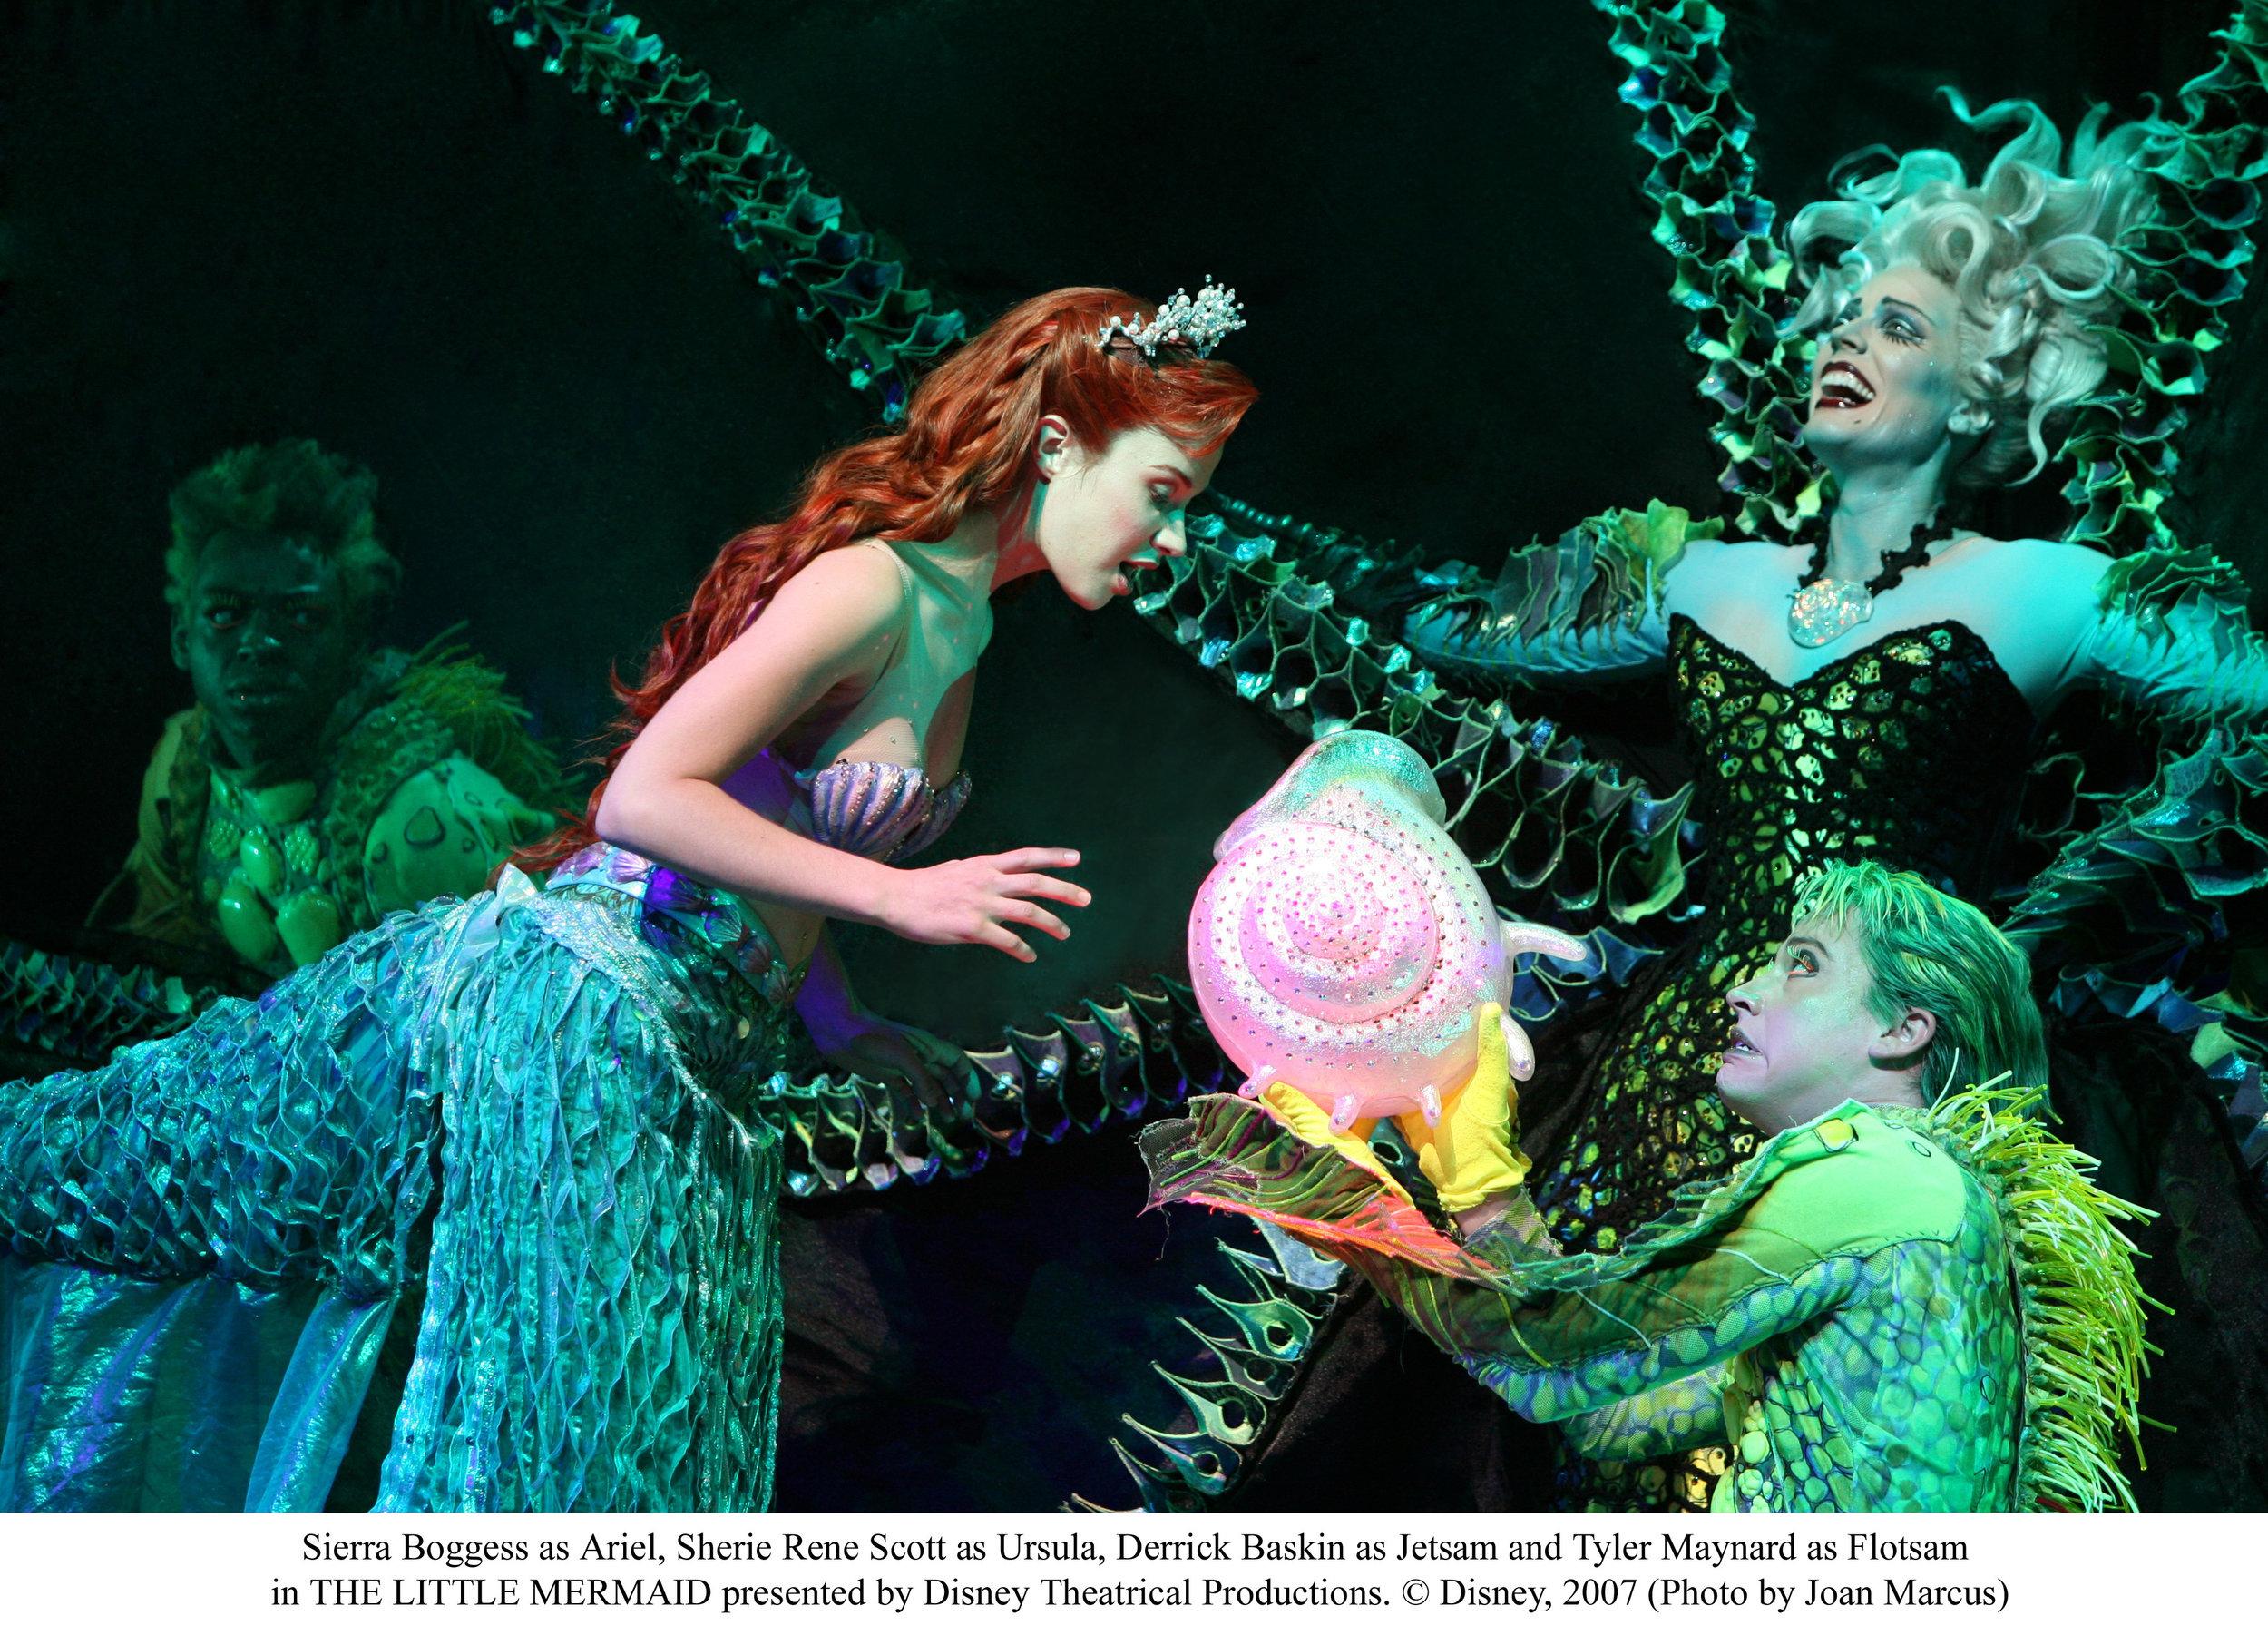 Sierra-Boggess-Little-Mermaid-Broadway-Sherie Sierra Derrick Tyler 2218 X.jpg